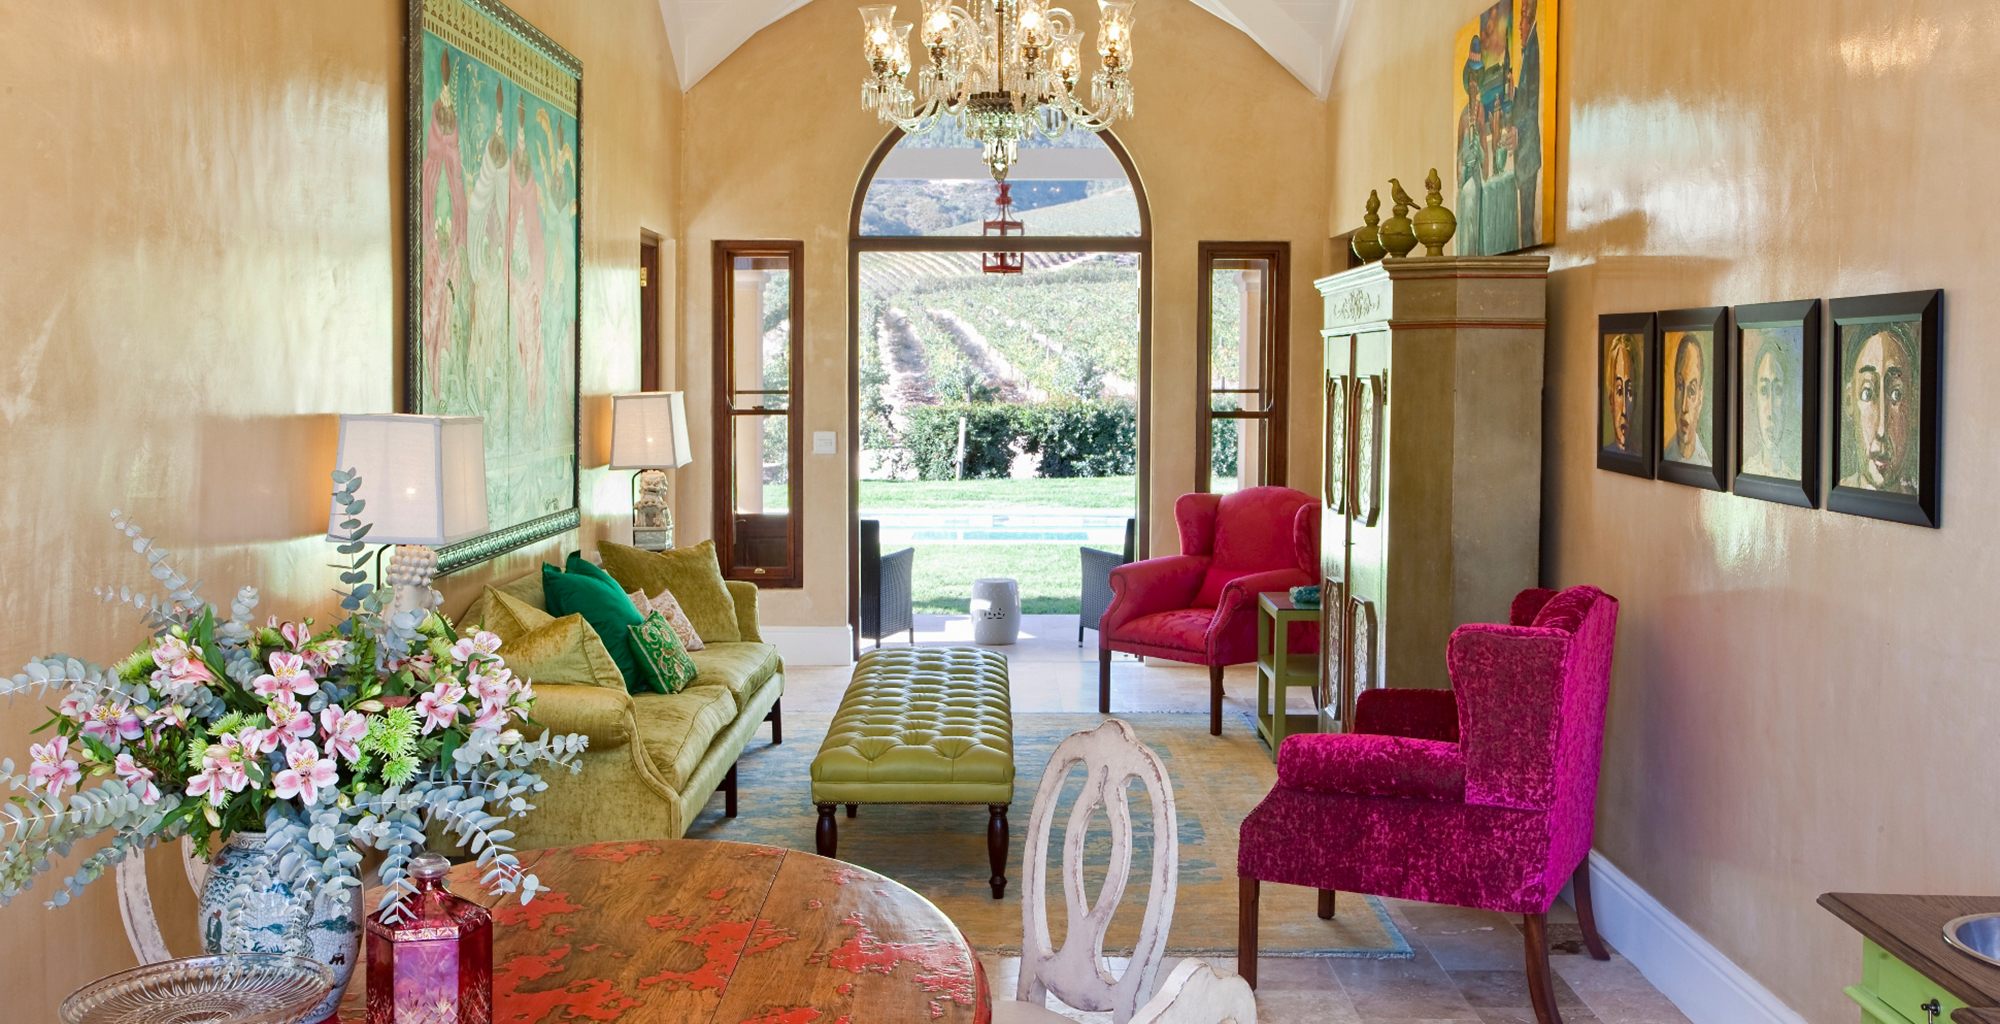 South-Africa-La-Residence-Lounge